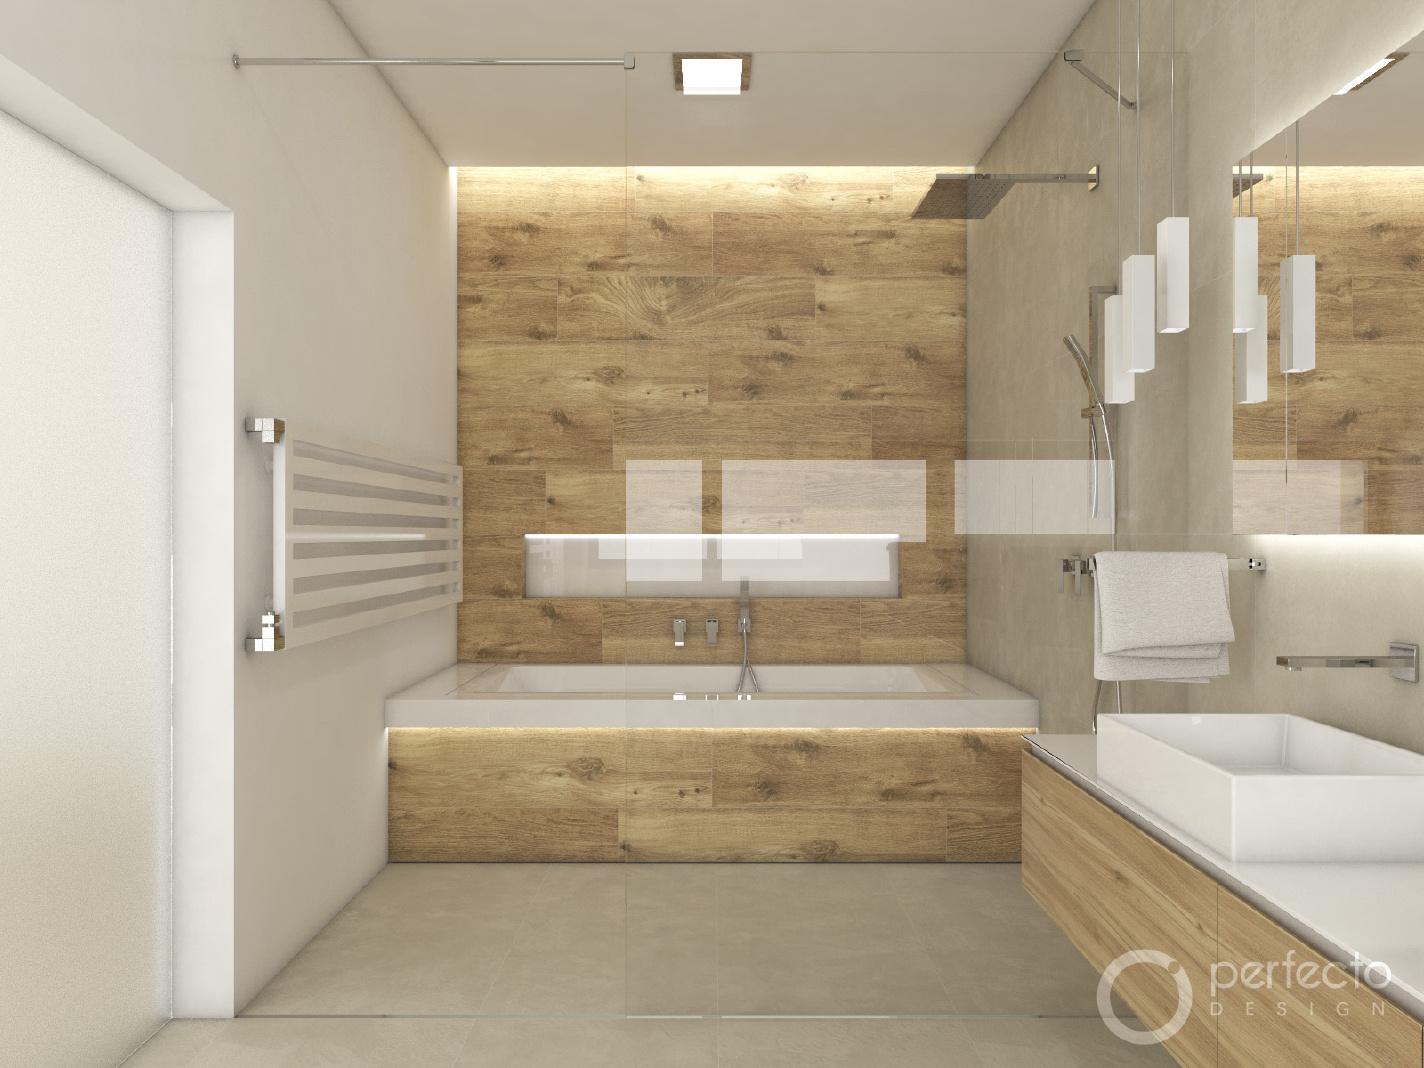 Modernes Badezimmer Sand | Perfecto Design Modernes Badezimmer